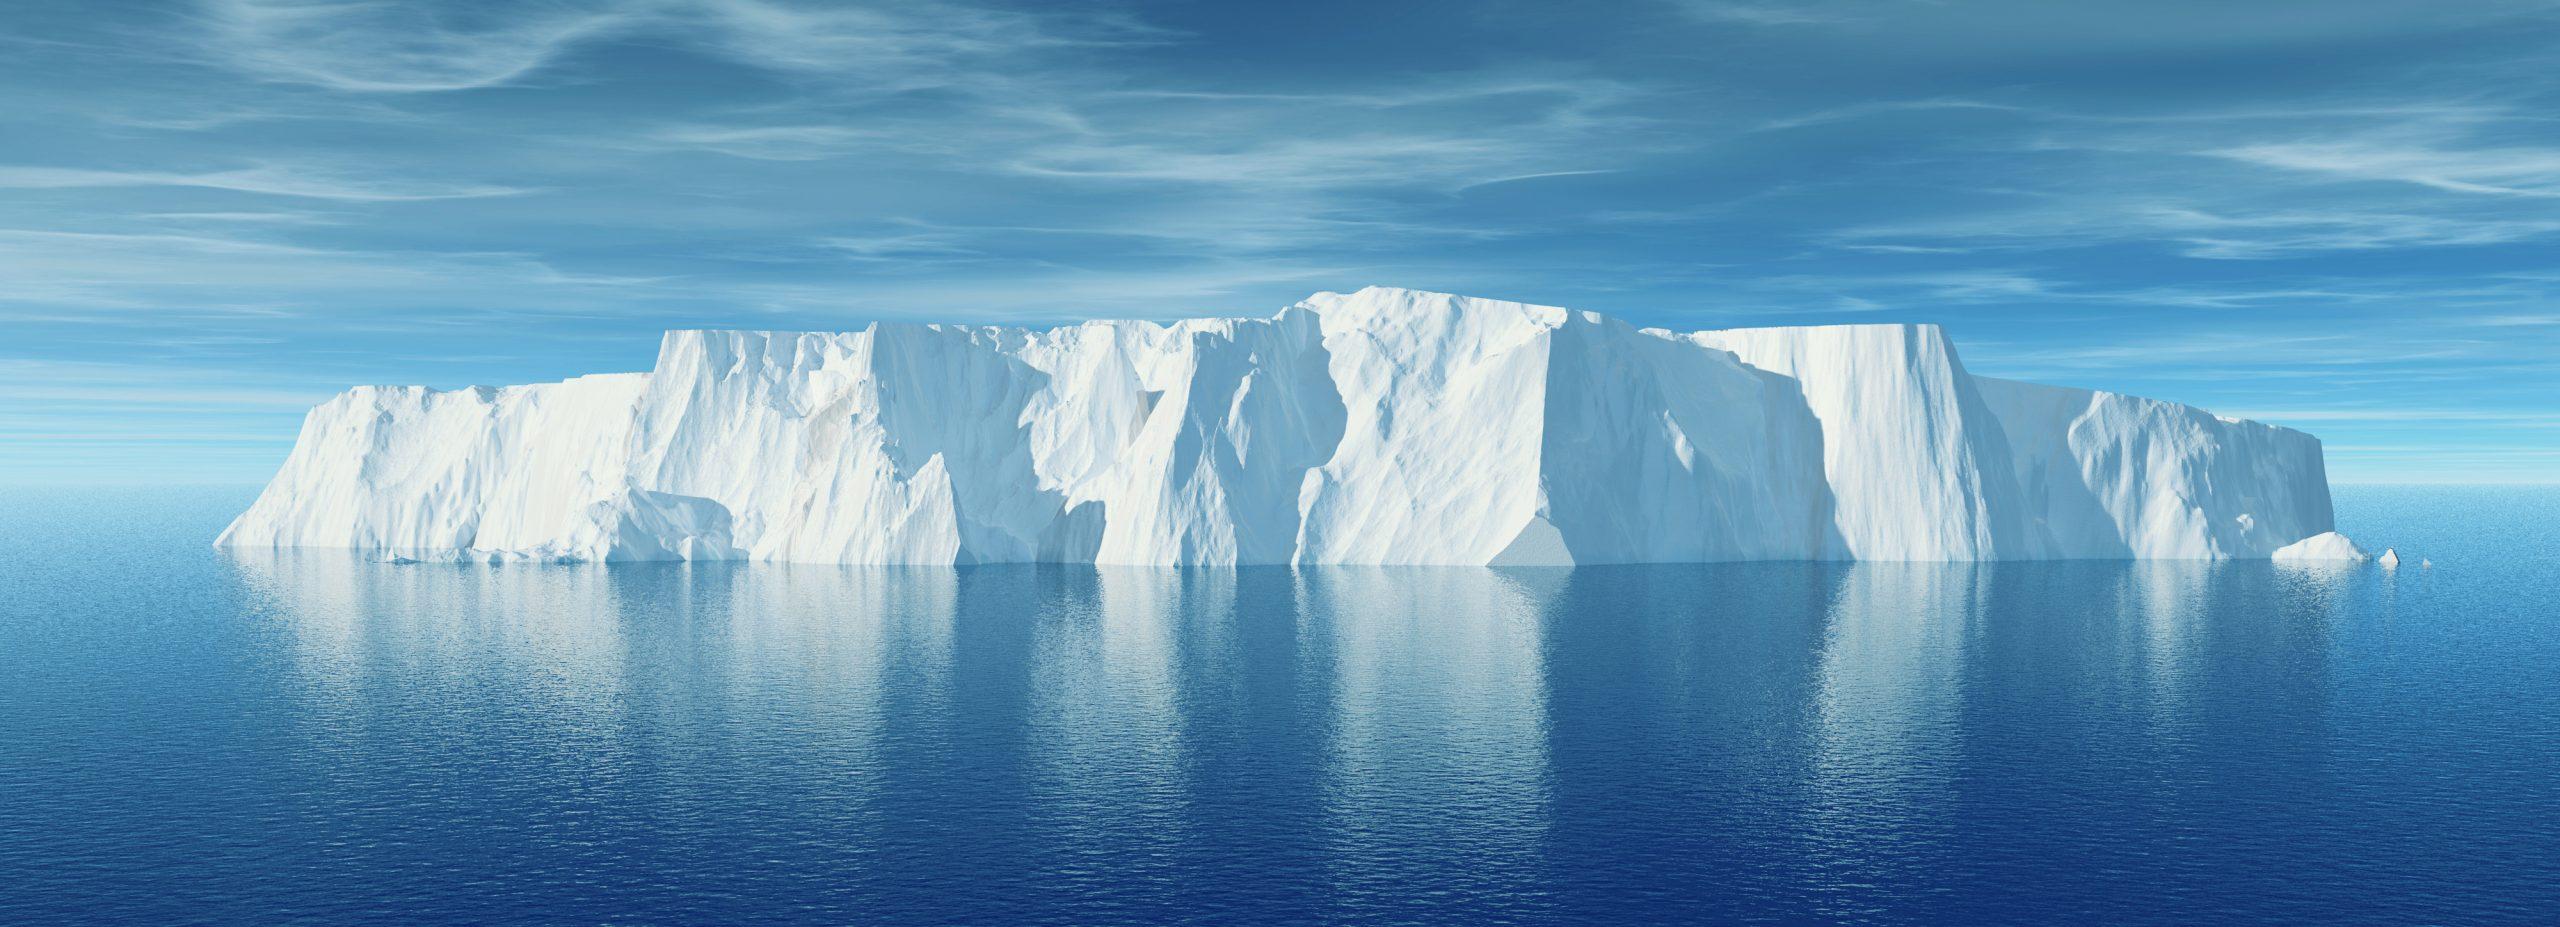 Iceberg environnement